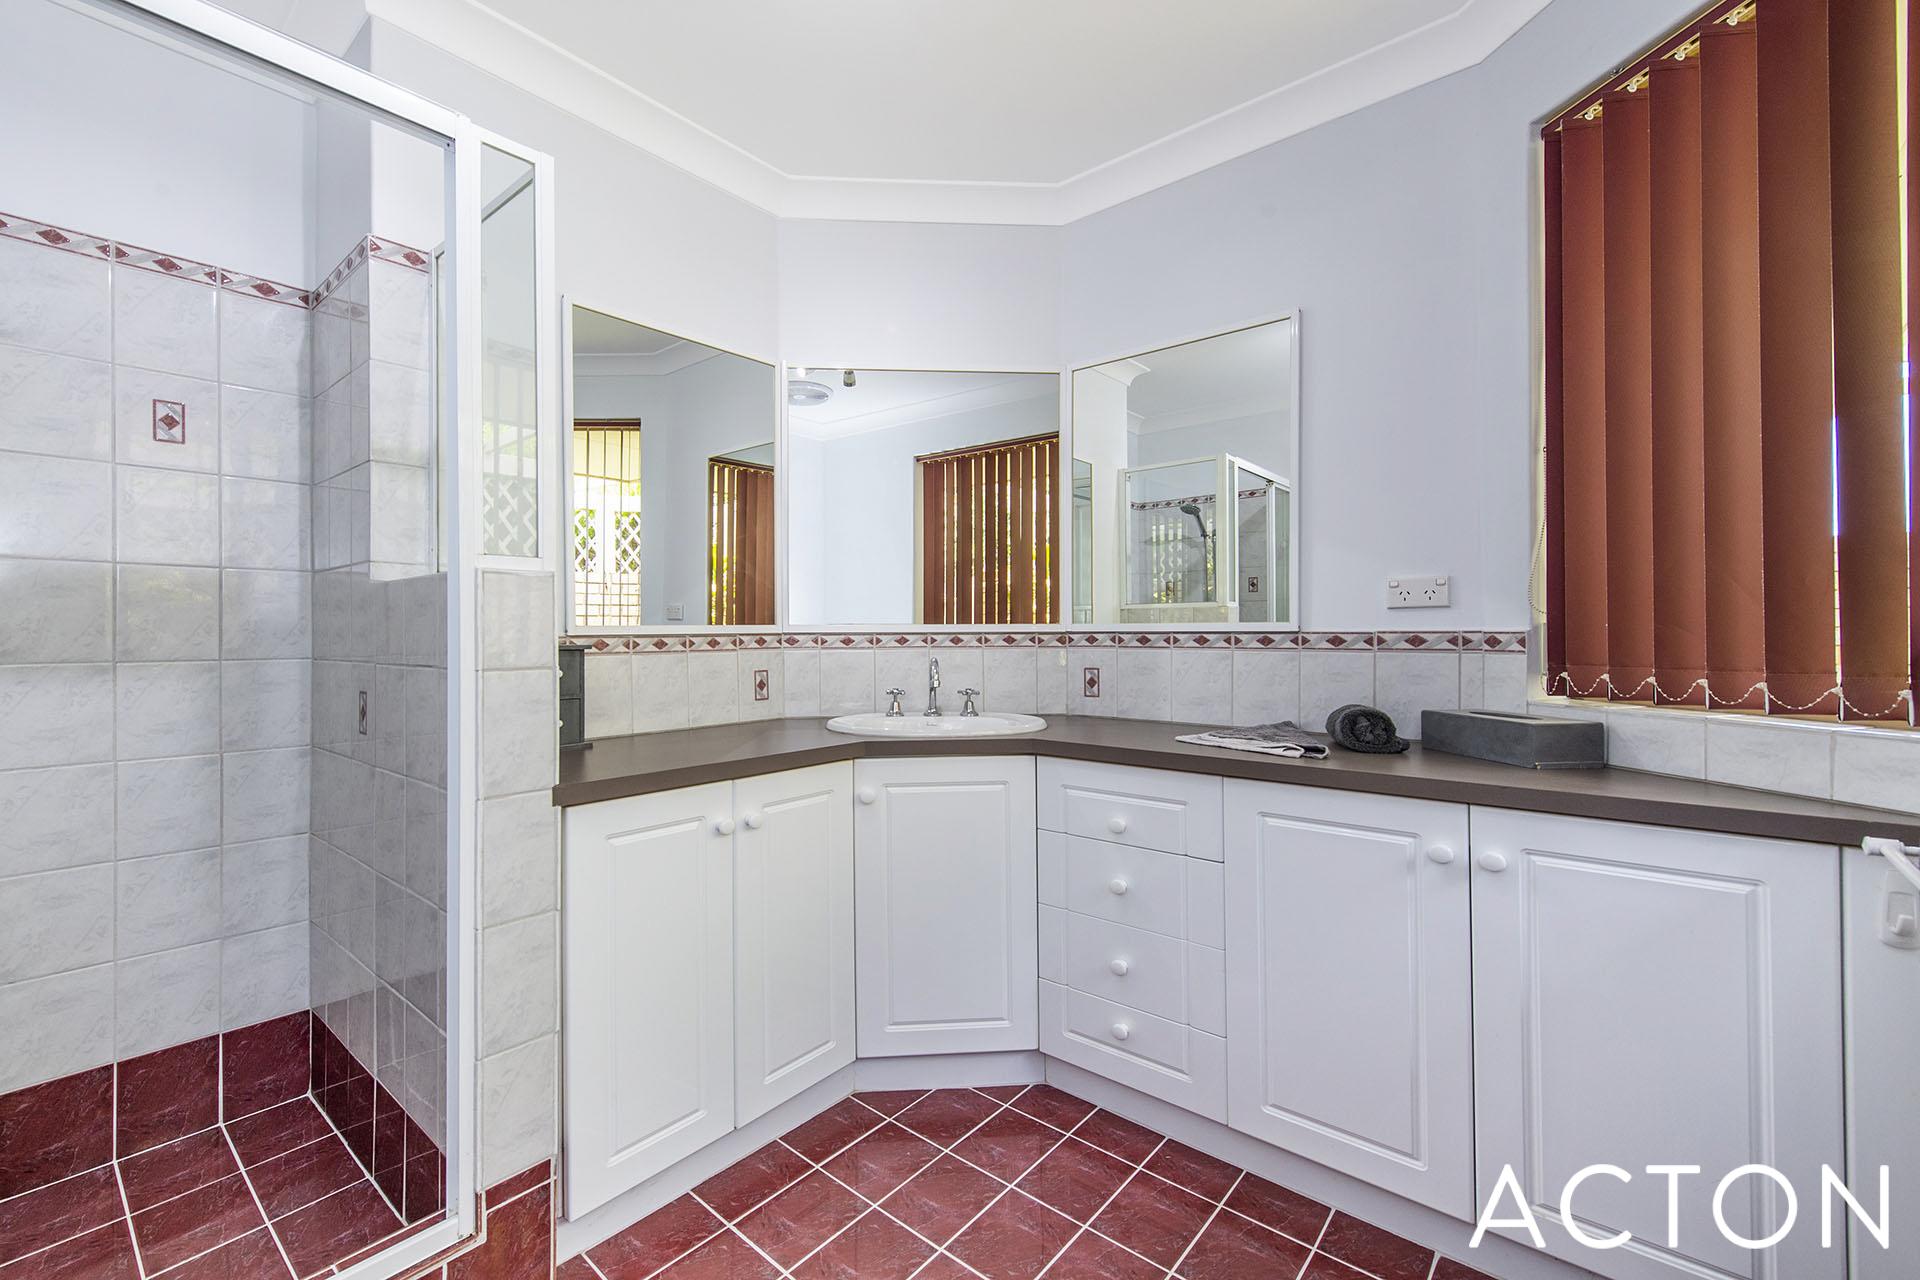 5 St Andrews Court Halls Head - House For Sale - 9261761 - ACTON Mandurah